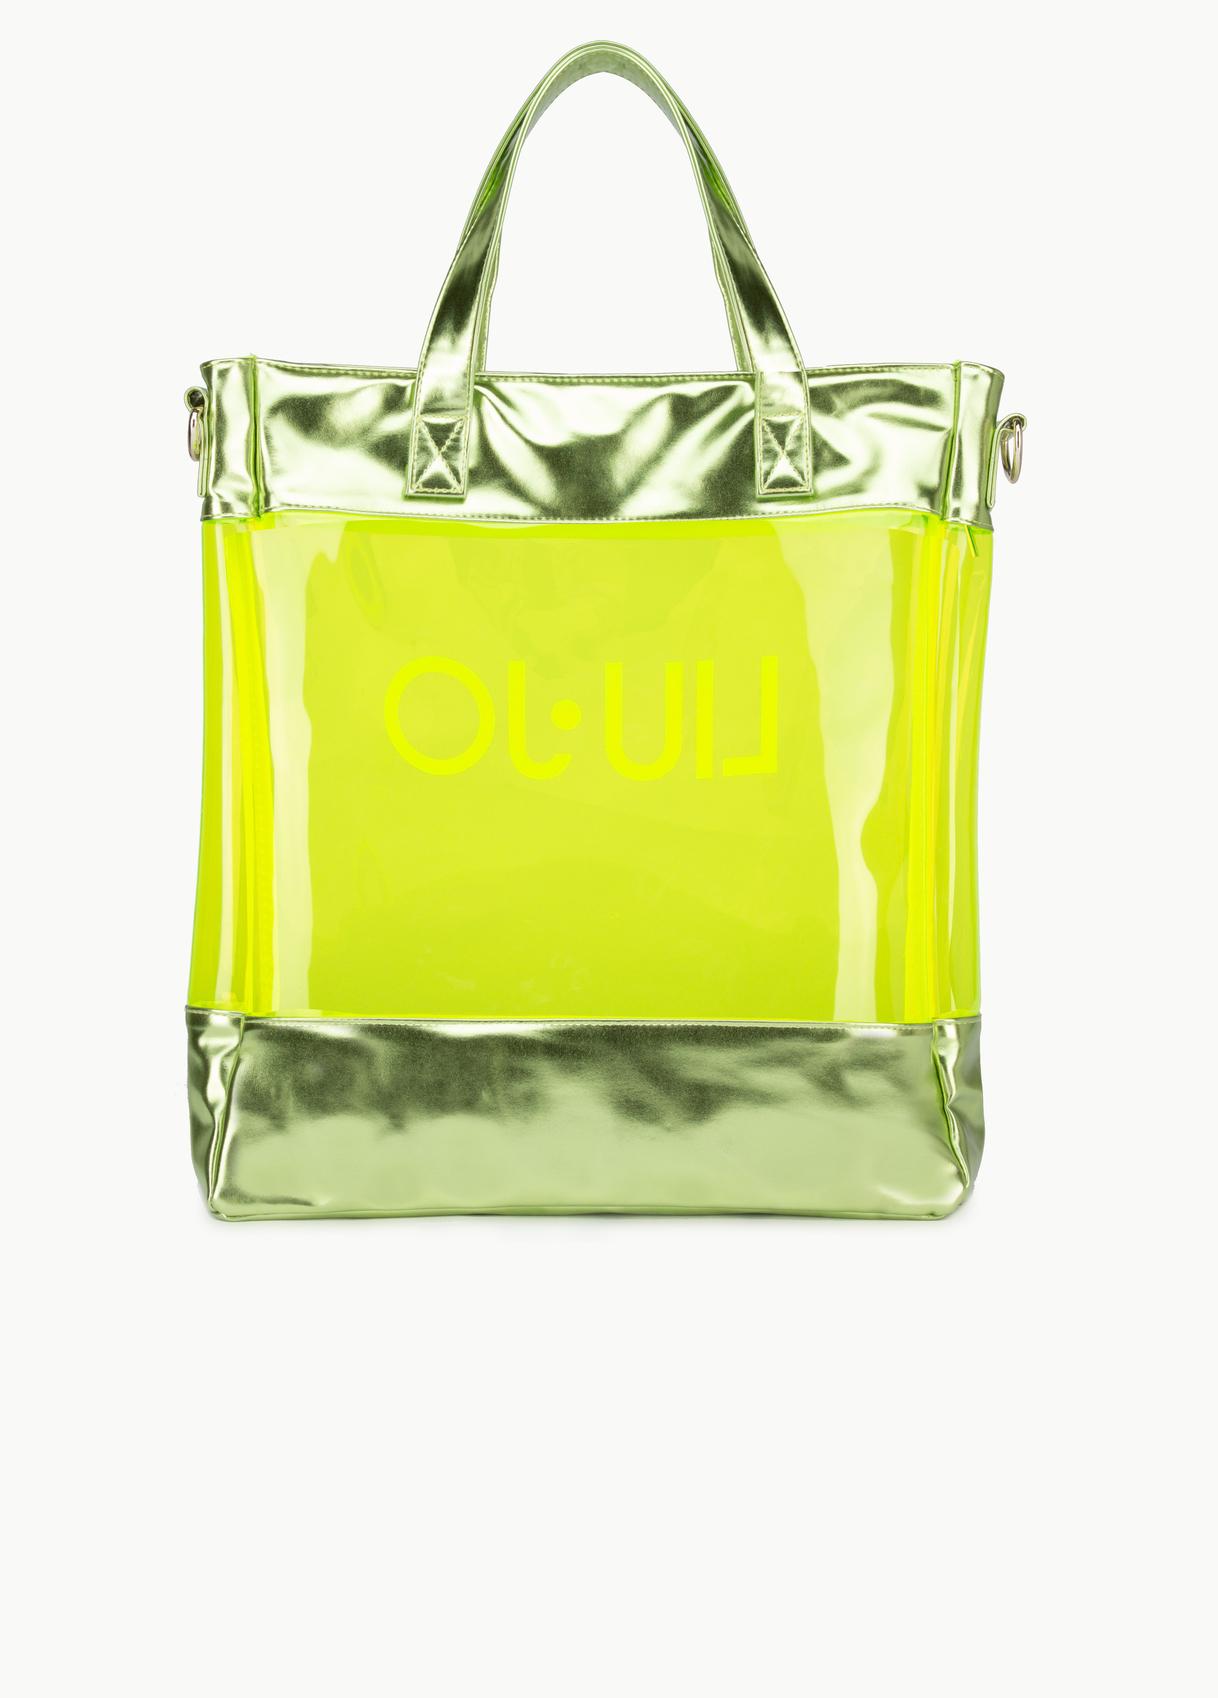 Shopping bag pvc germoglio - LIU JO